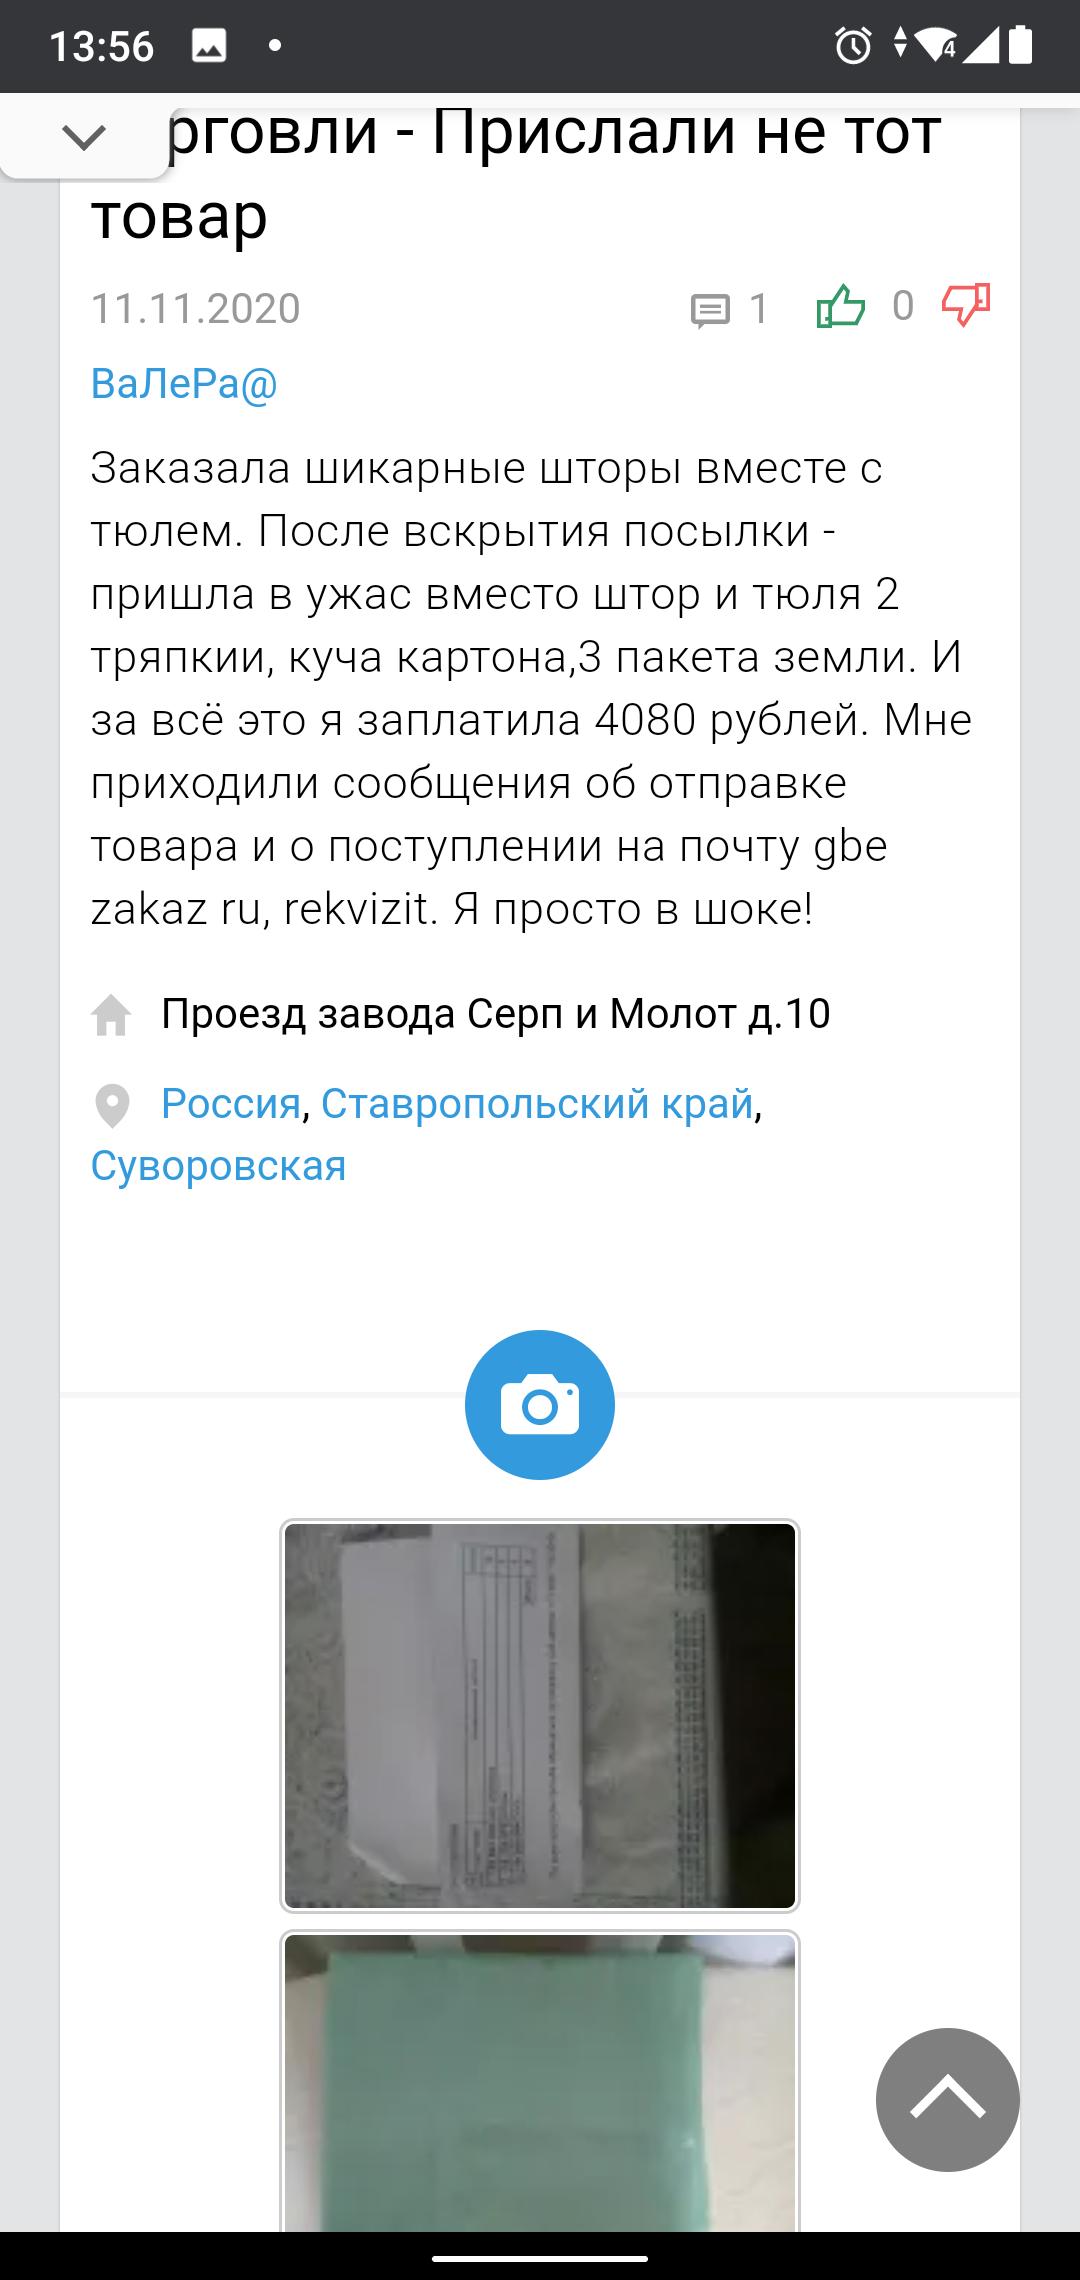 Screenshot_20210113-135638.png